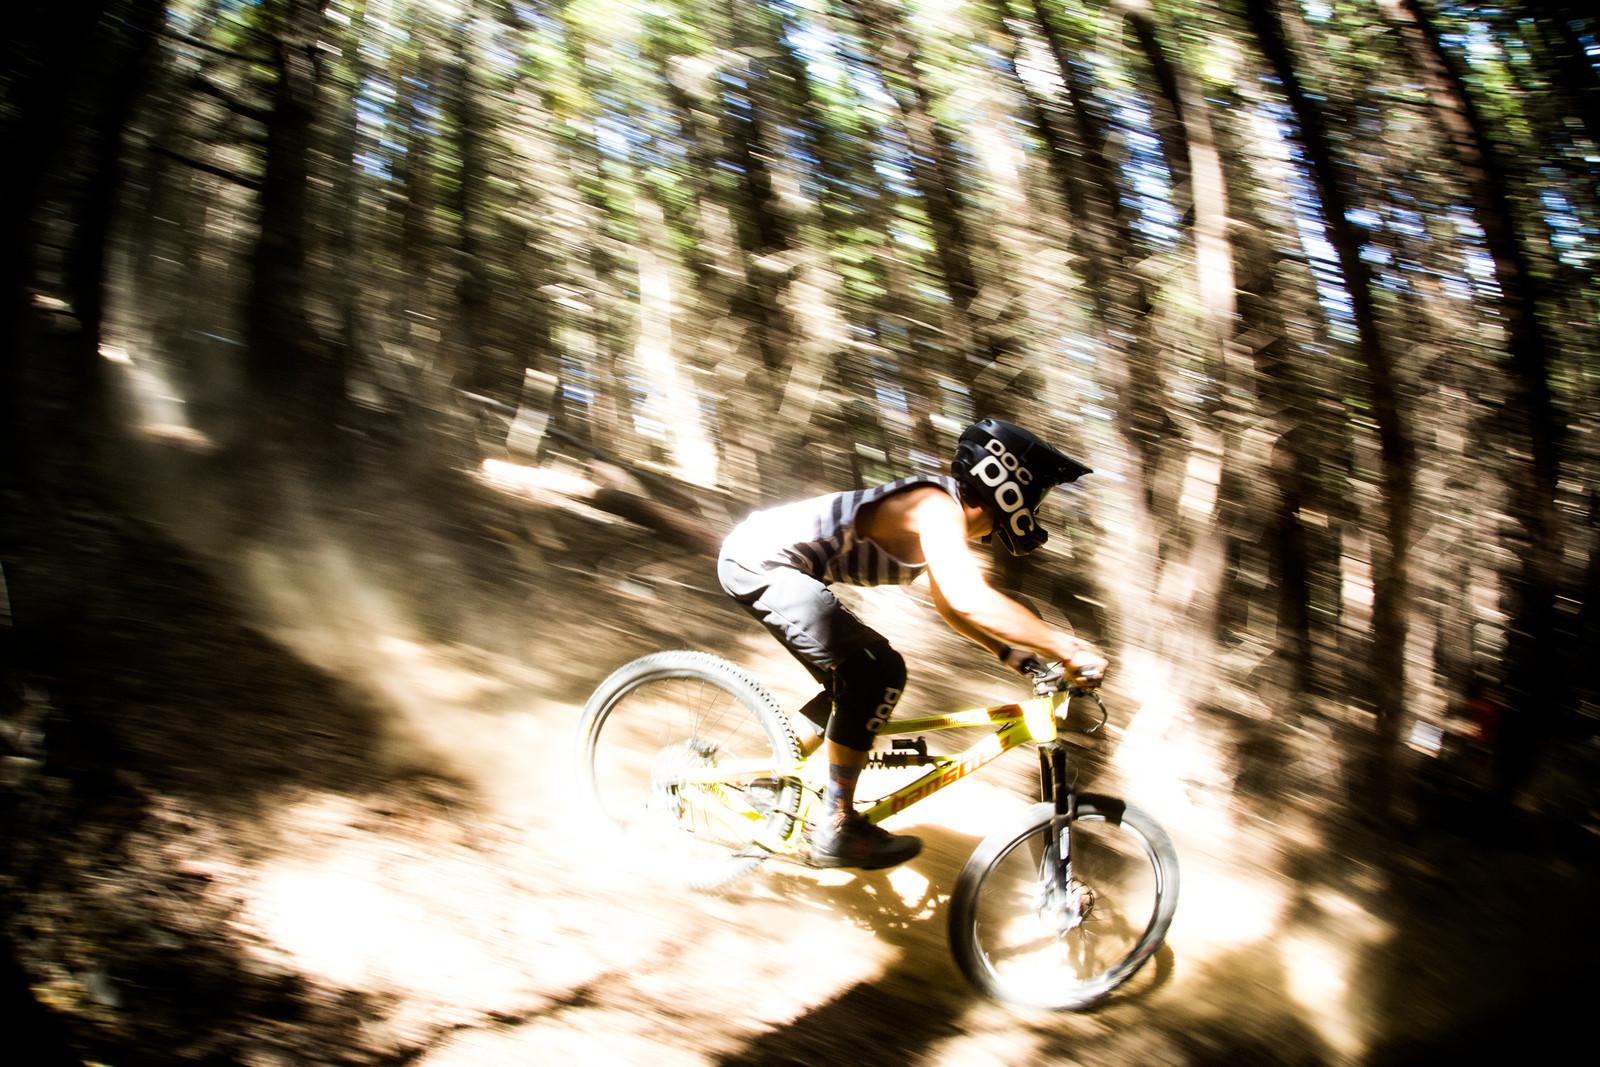 Olivier Cuvet - Homegrown NZ Downhill - Vertigo Bikes Ride More DH Series Race 1 - Mountain Biking Pictures - Vital MTB